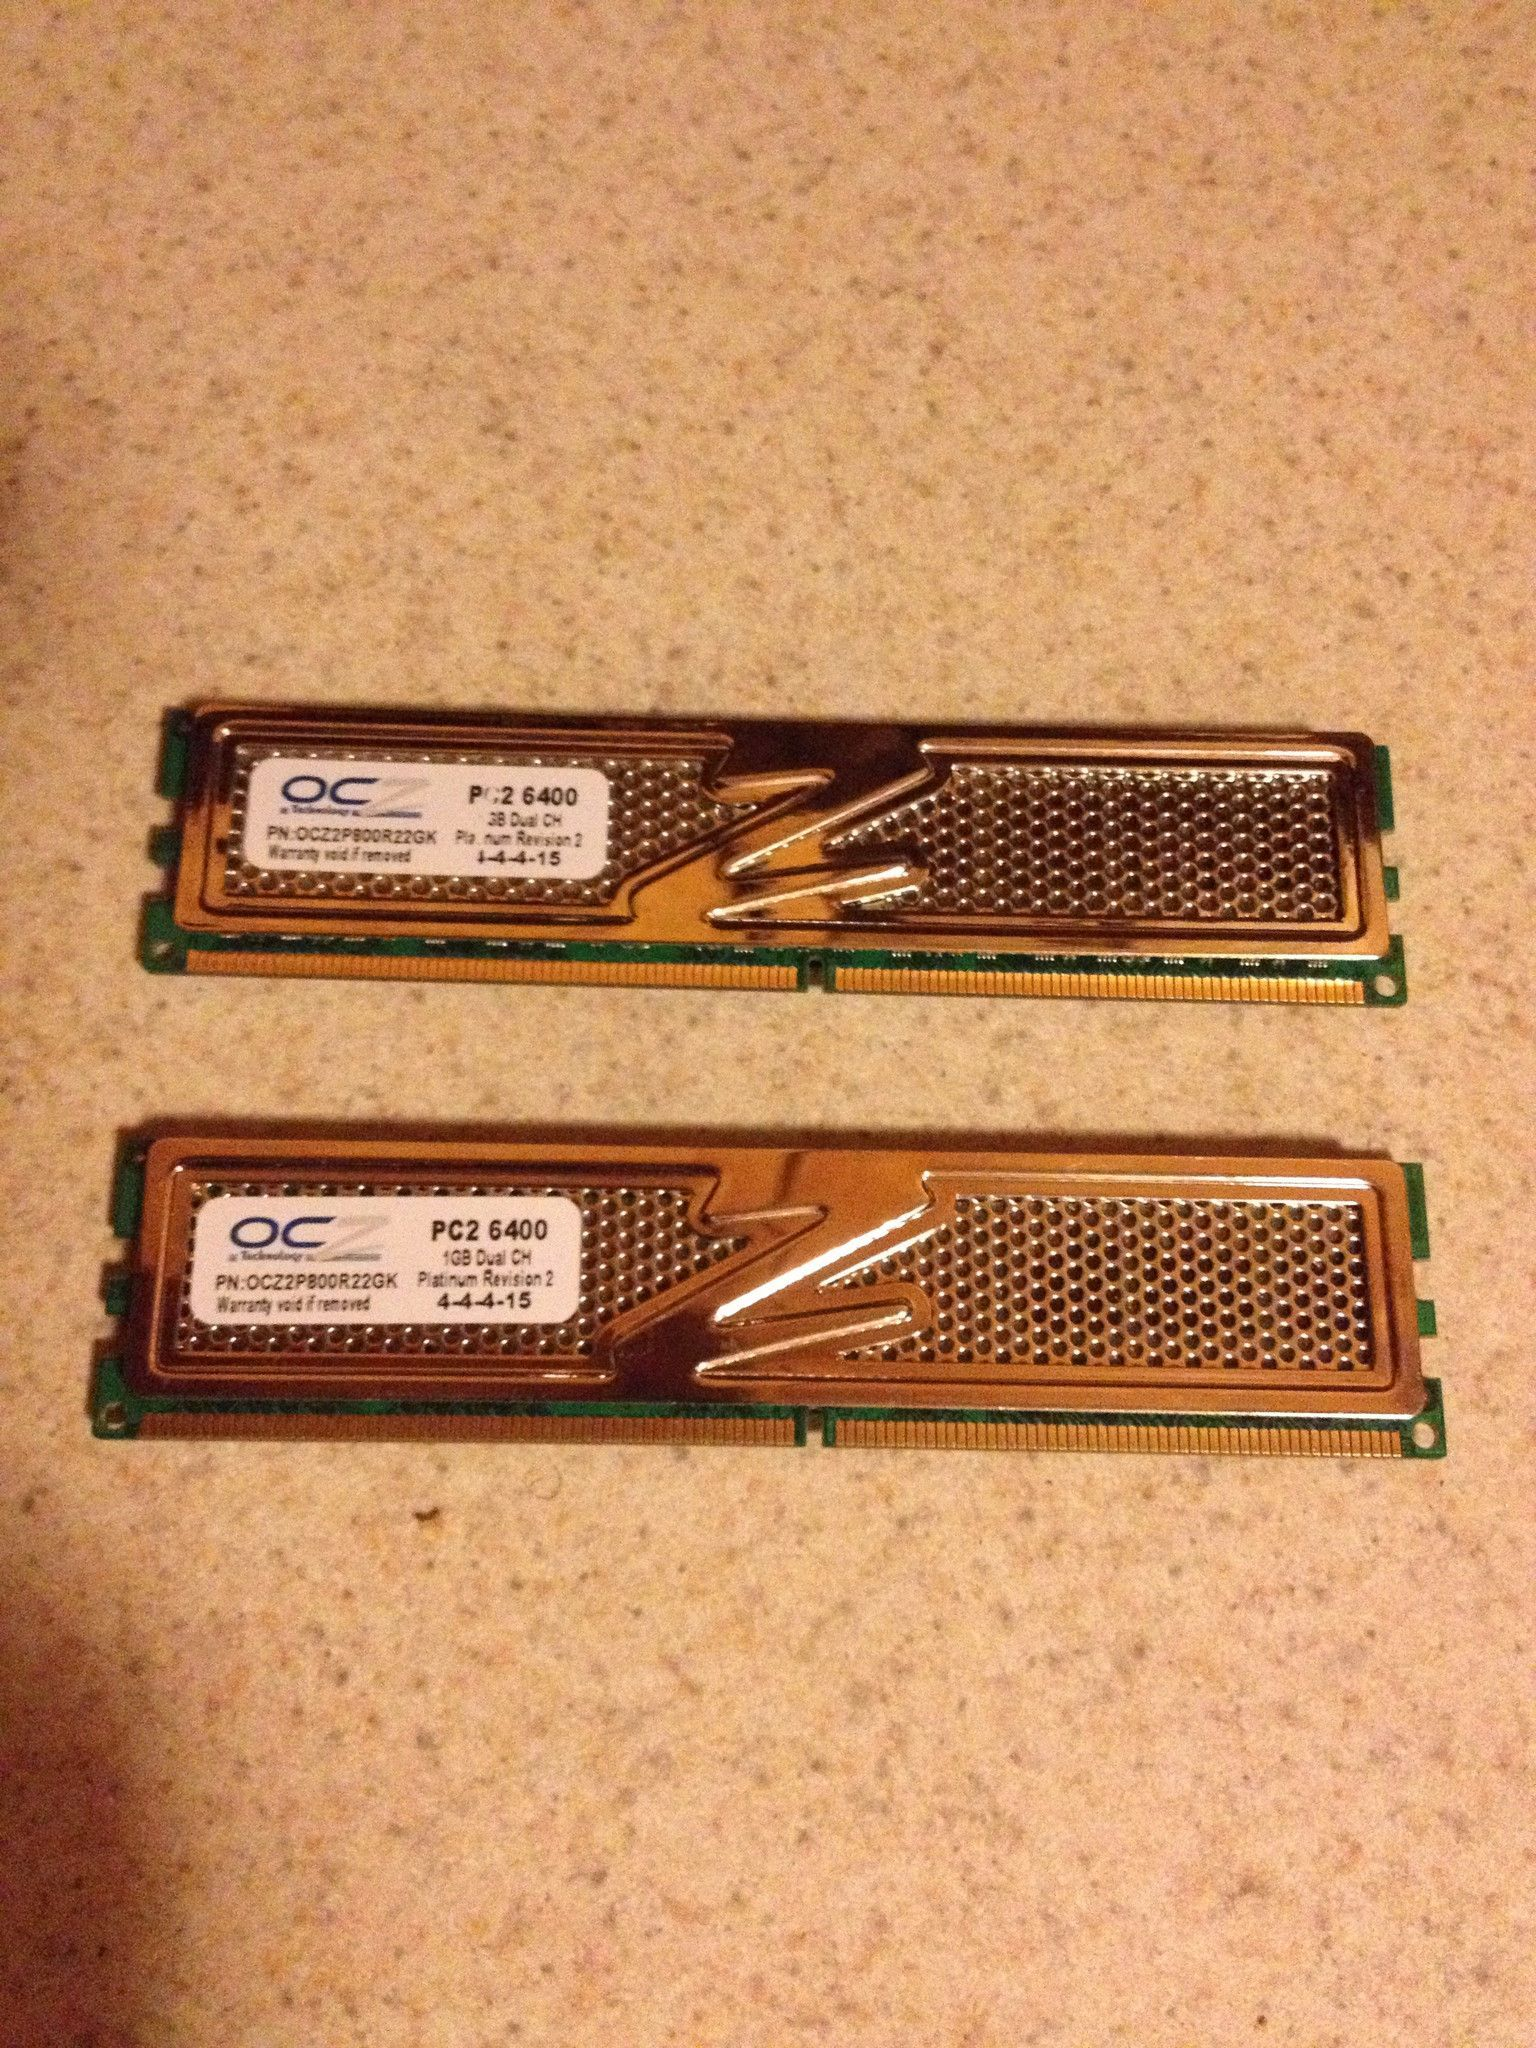 Memory 1GB Dual CH Platinum revision 2 4-4-15 PC2 6400 Set